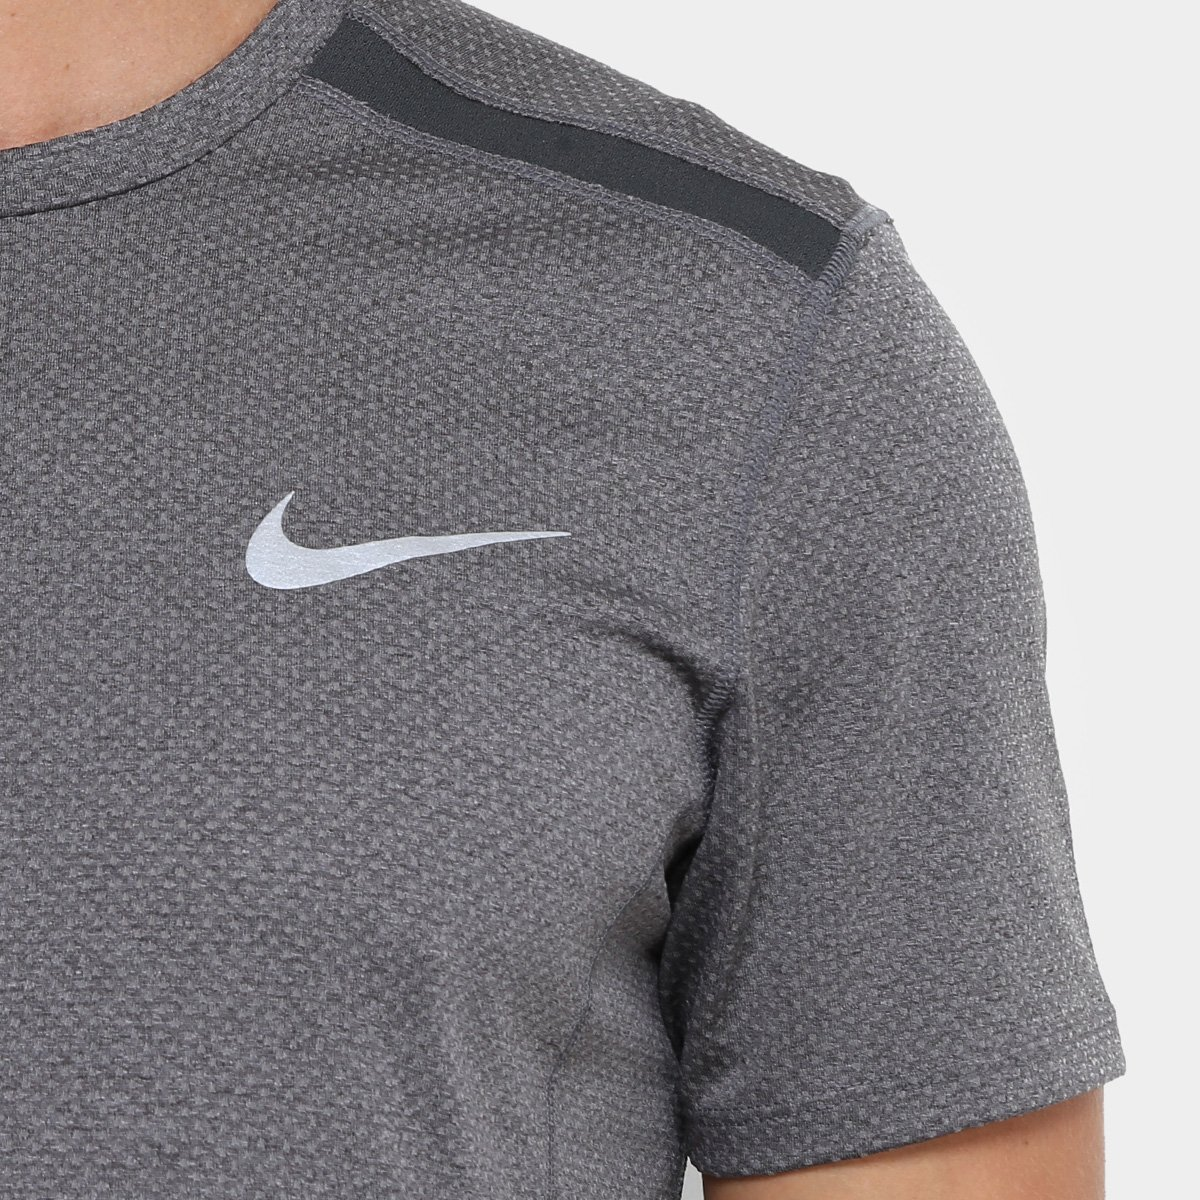 2f71a89755 Camiseta Nike Dry Cool Miler SS Masculina - Preto - Compre Agora ...